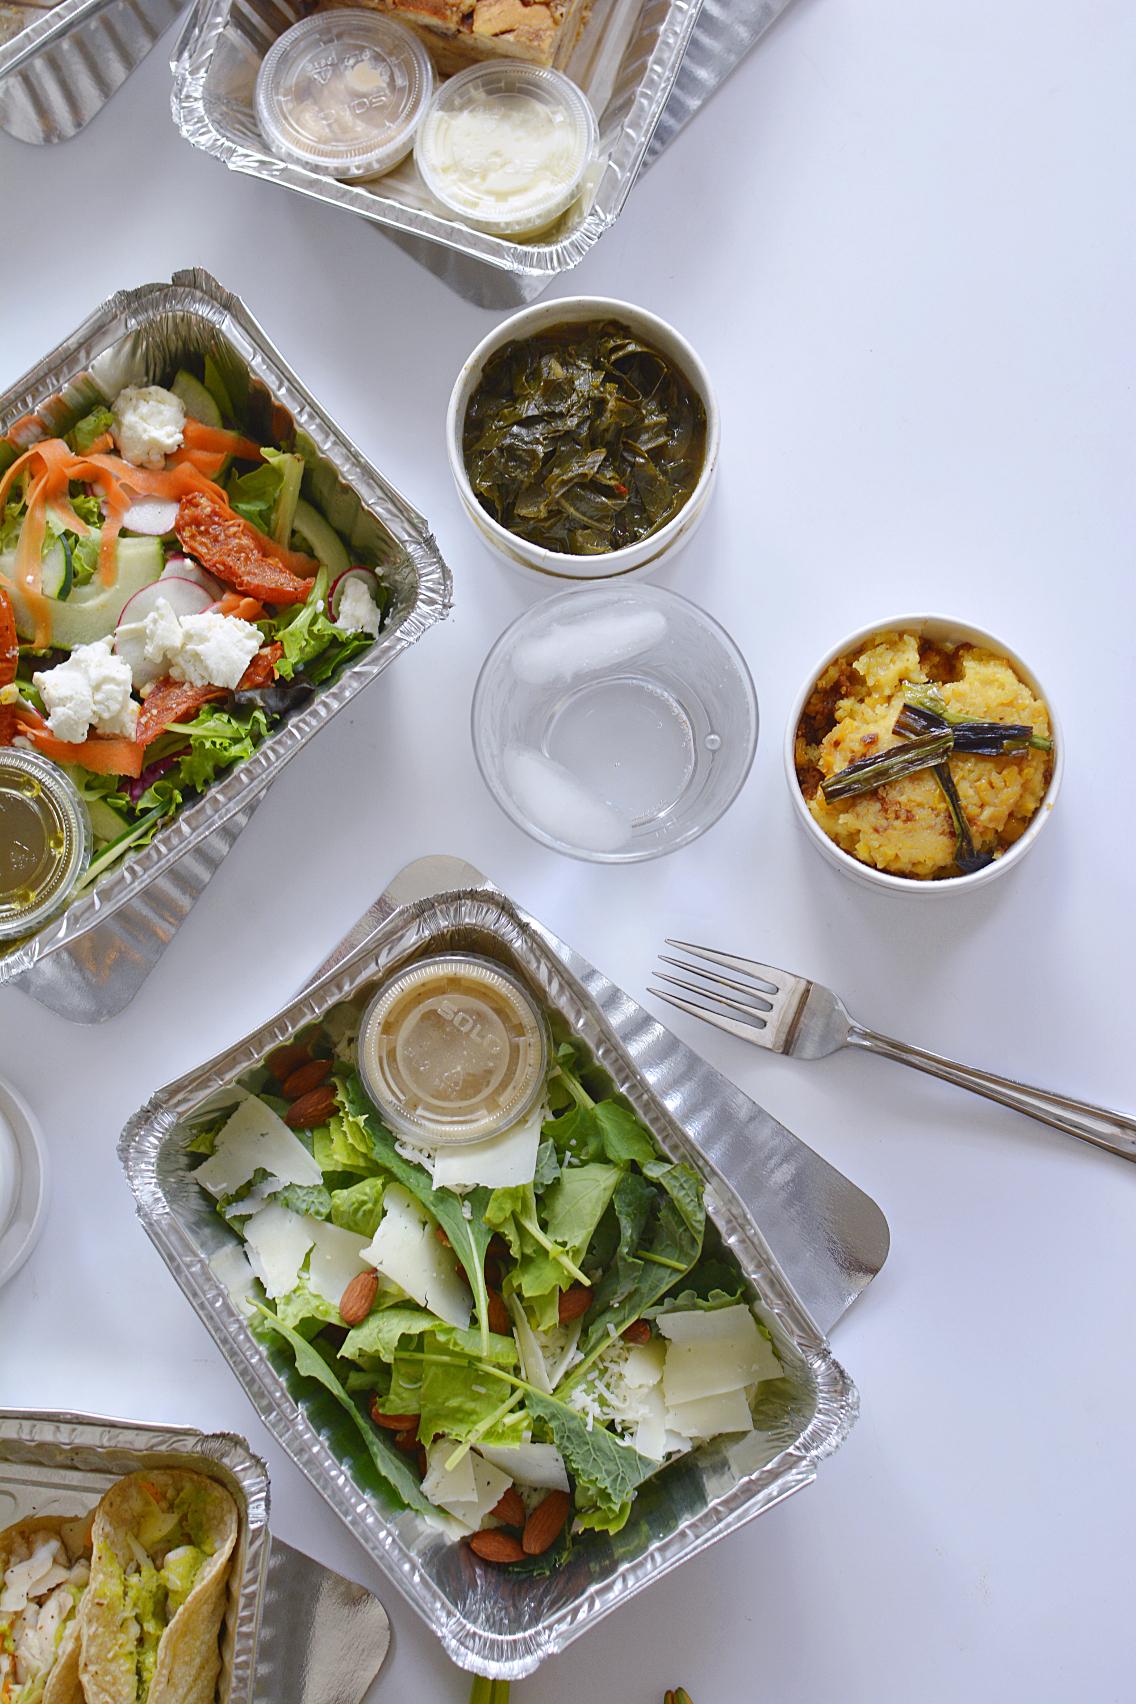 County BBQ DMK Kale and Romaine Caesar Salad 2